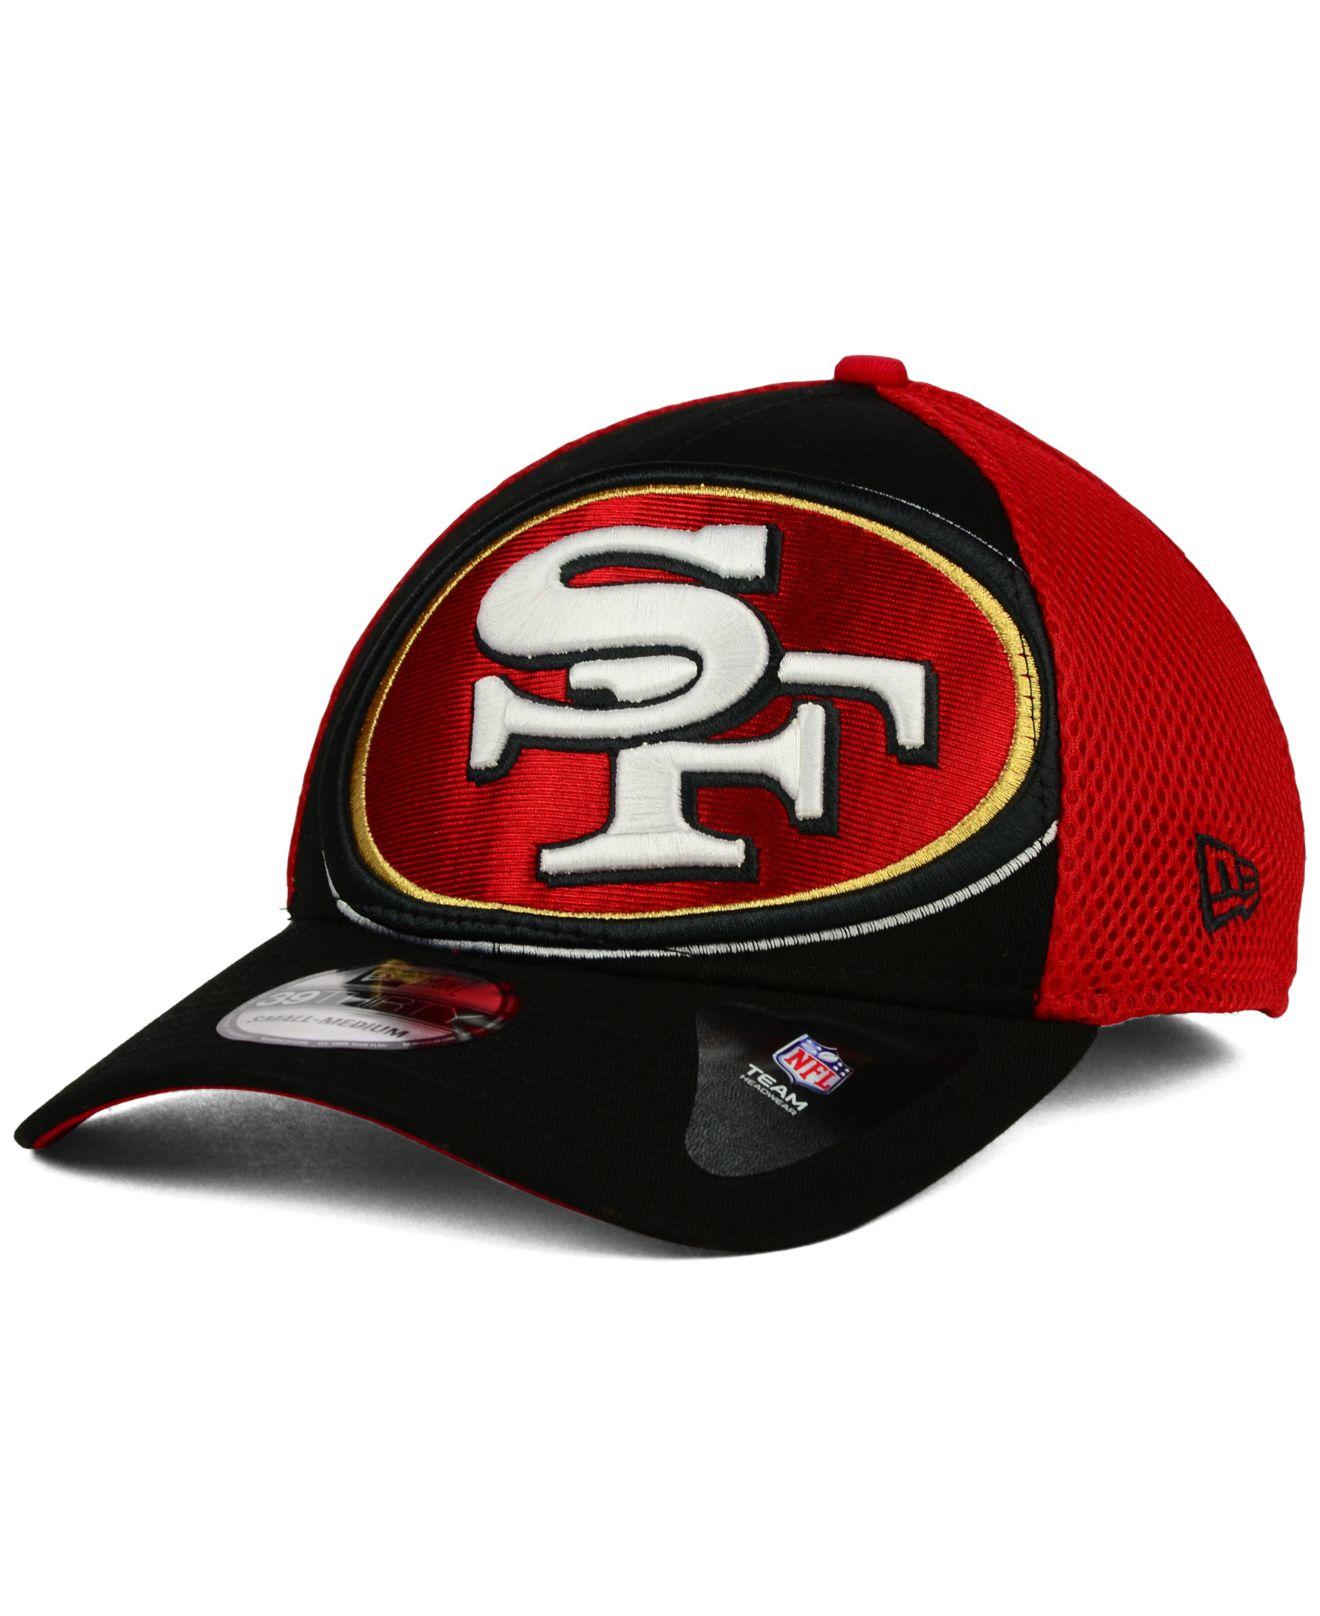 ... new era nfl 2 tone 59fifty cap 45872 793b7  netherlands lyst ktz san  francisco 49ers logo blimp 39thirty cap in red for men 95324 c1086 823c85d4af38